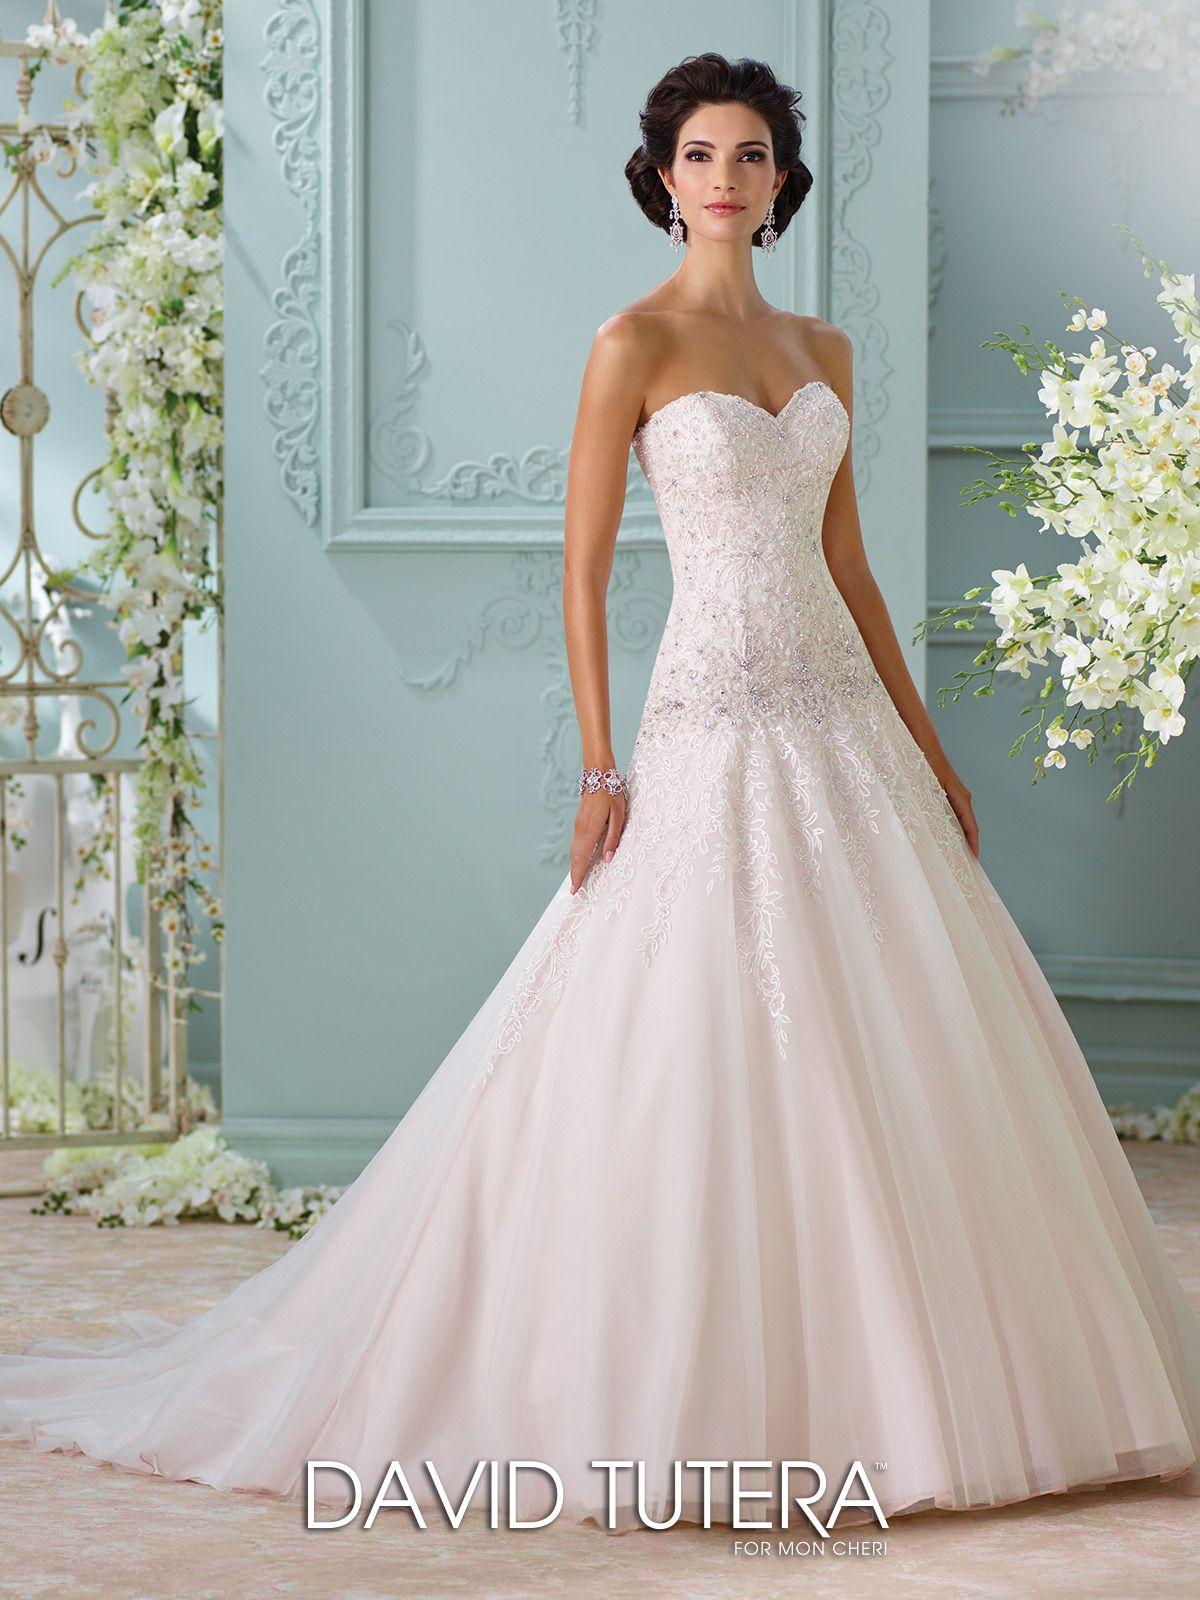 Dropped Waist Sweetheart Neckline A-Line Wedding Dress- 116214 Ora ...